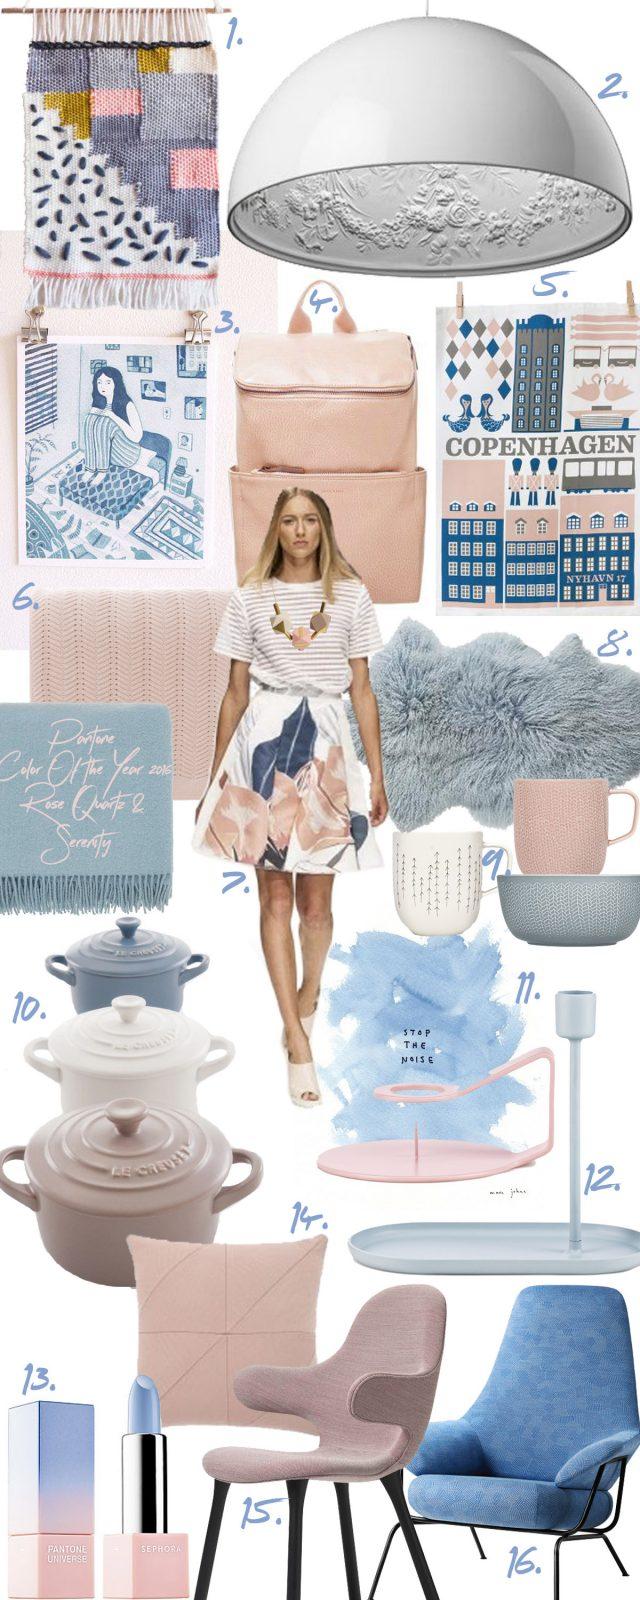 Pantone Color of the year 2016: Rose Quartz & Serenity